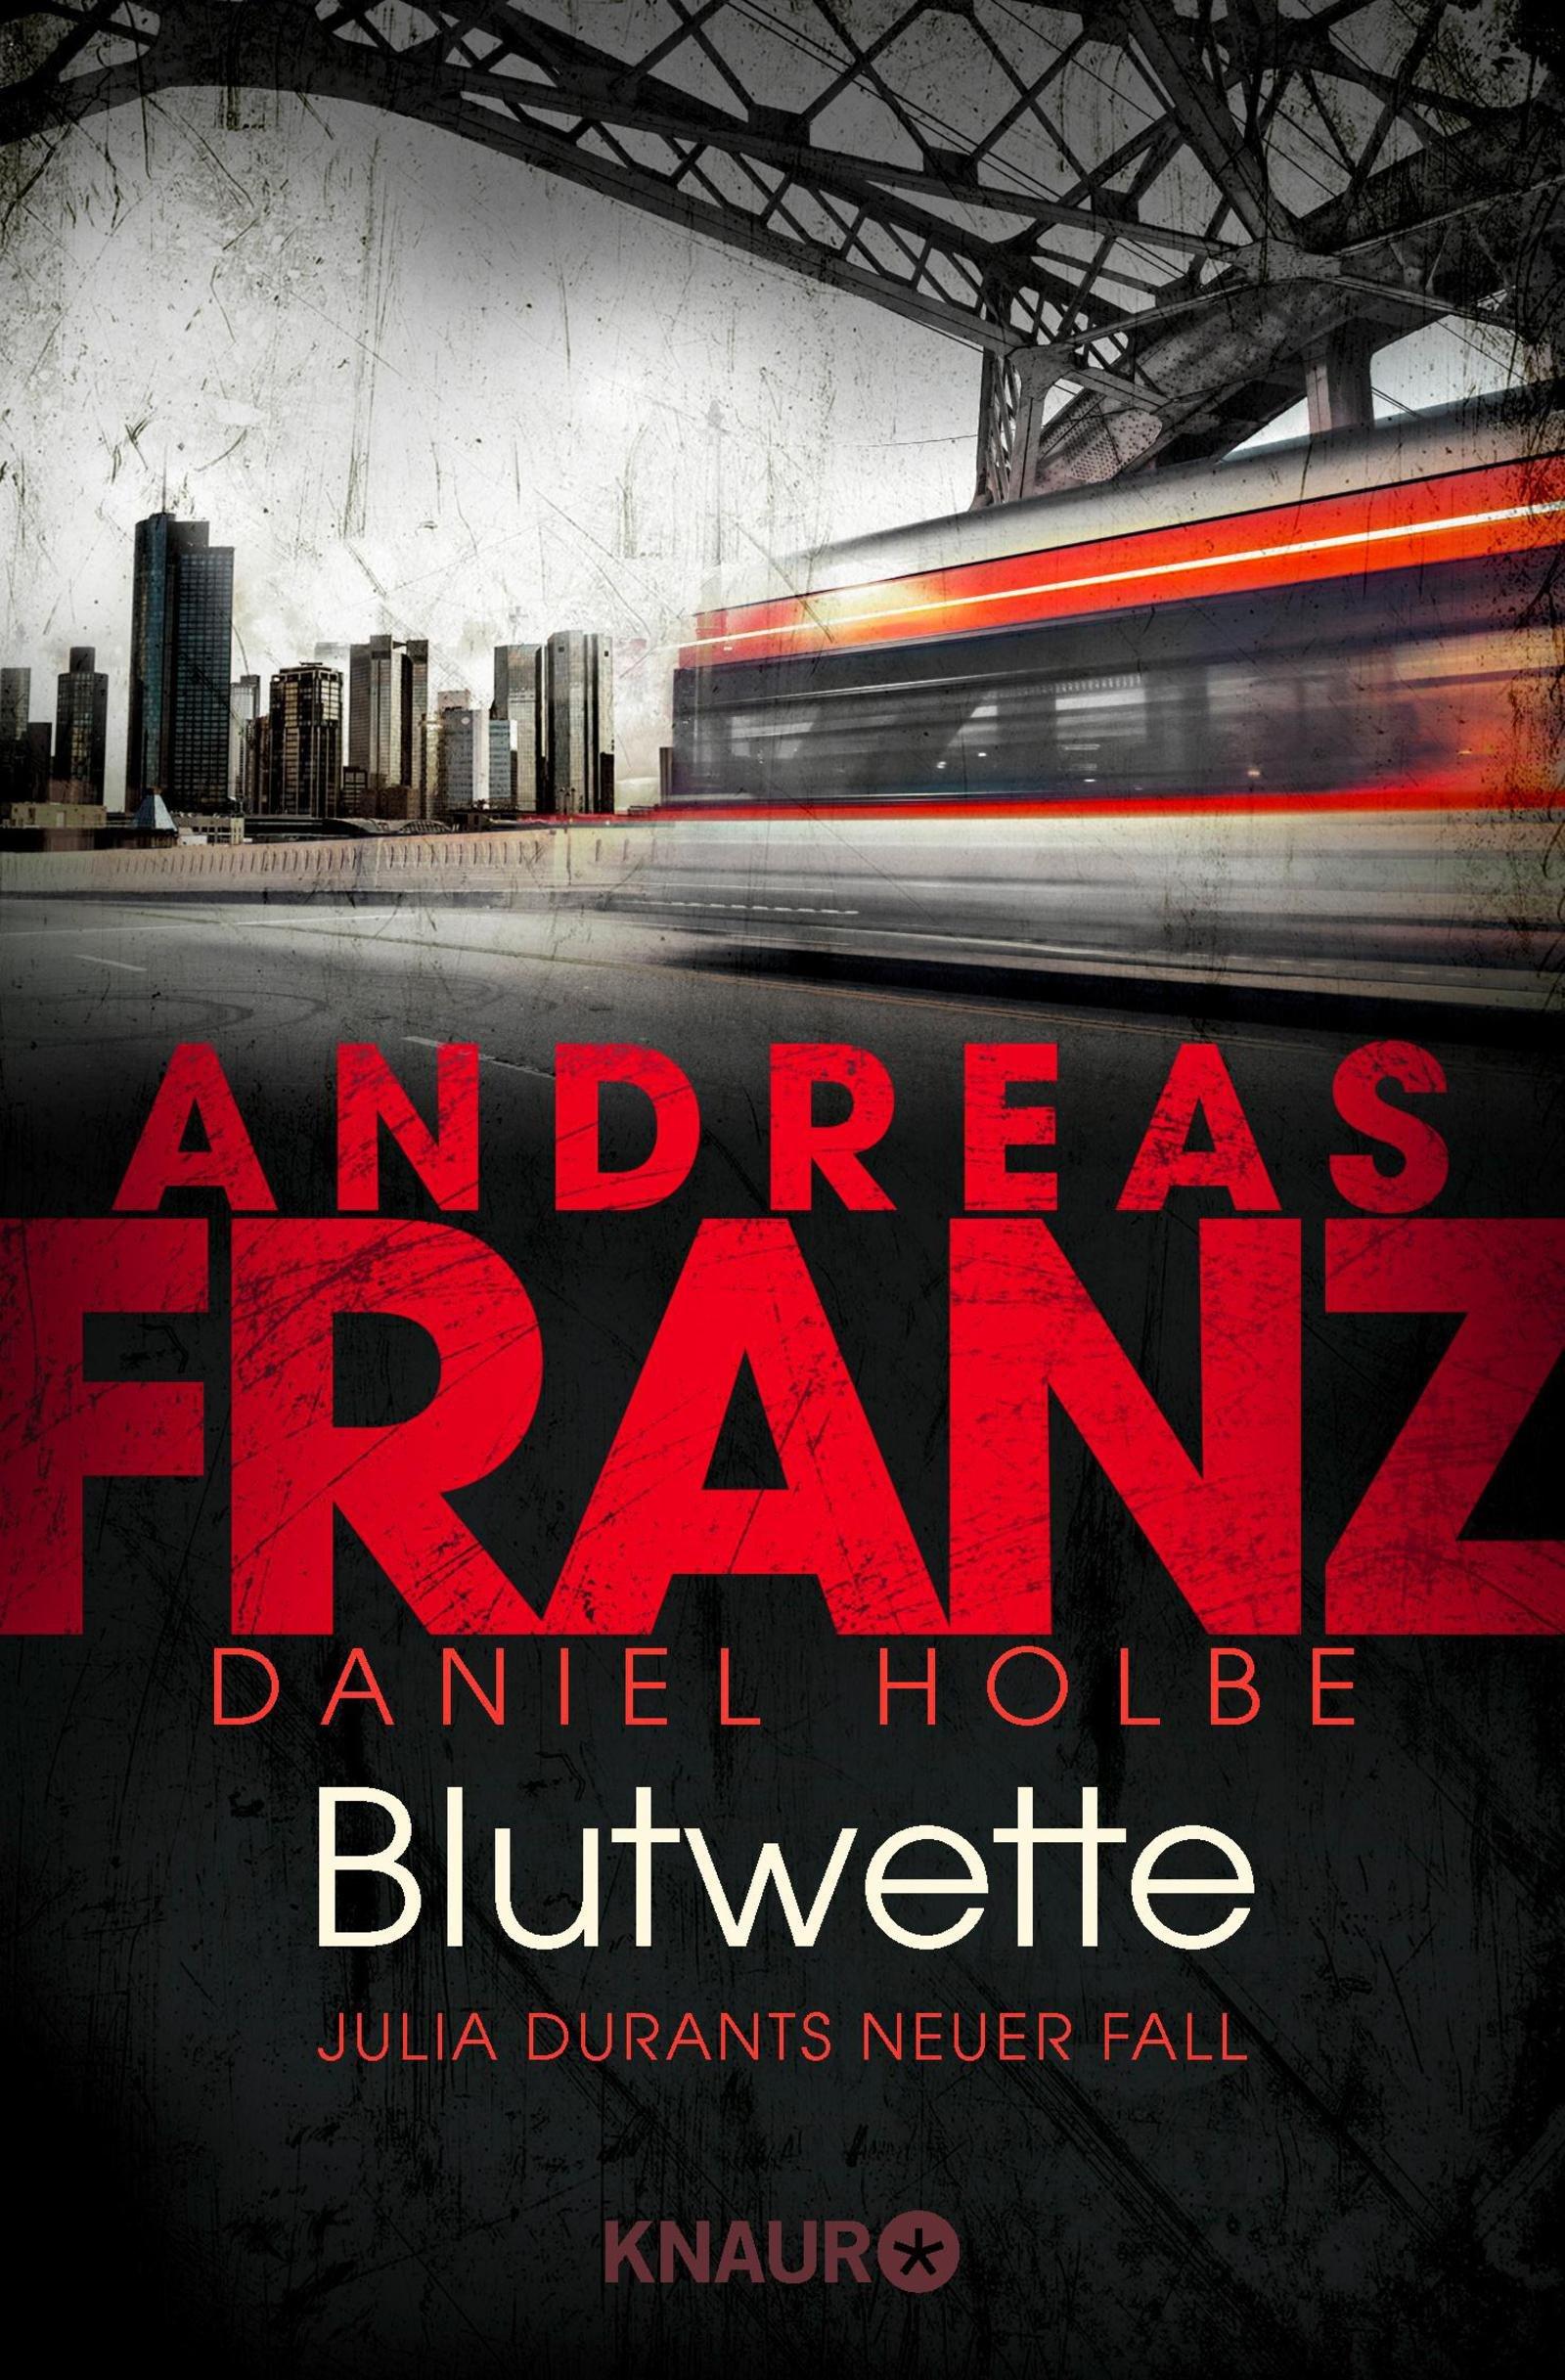 Blutwette: Julia Durants neuer Fall (Julia Durant ermittelt, Band 18) Taschenbuch – 20. August 2018 Andreas Franz Daniel Holbe Knaur TB 3426520842